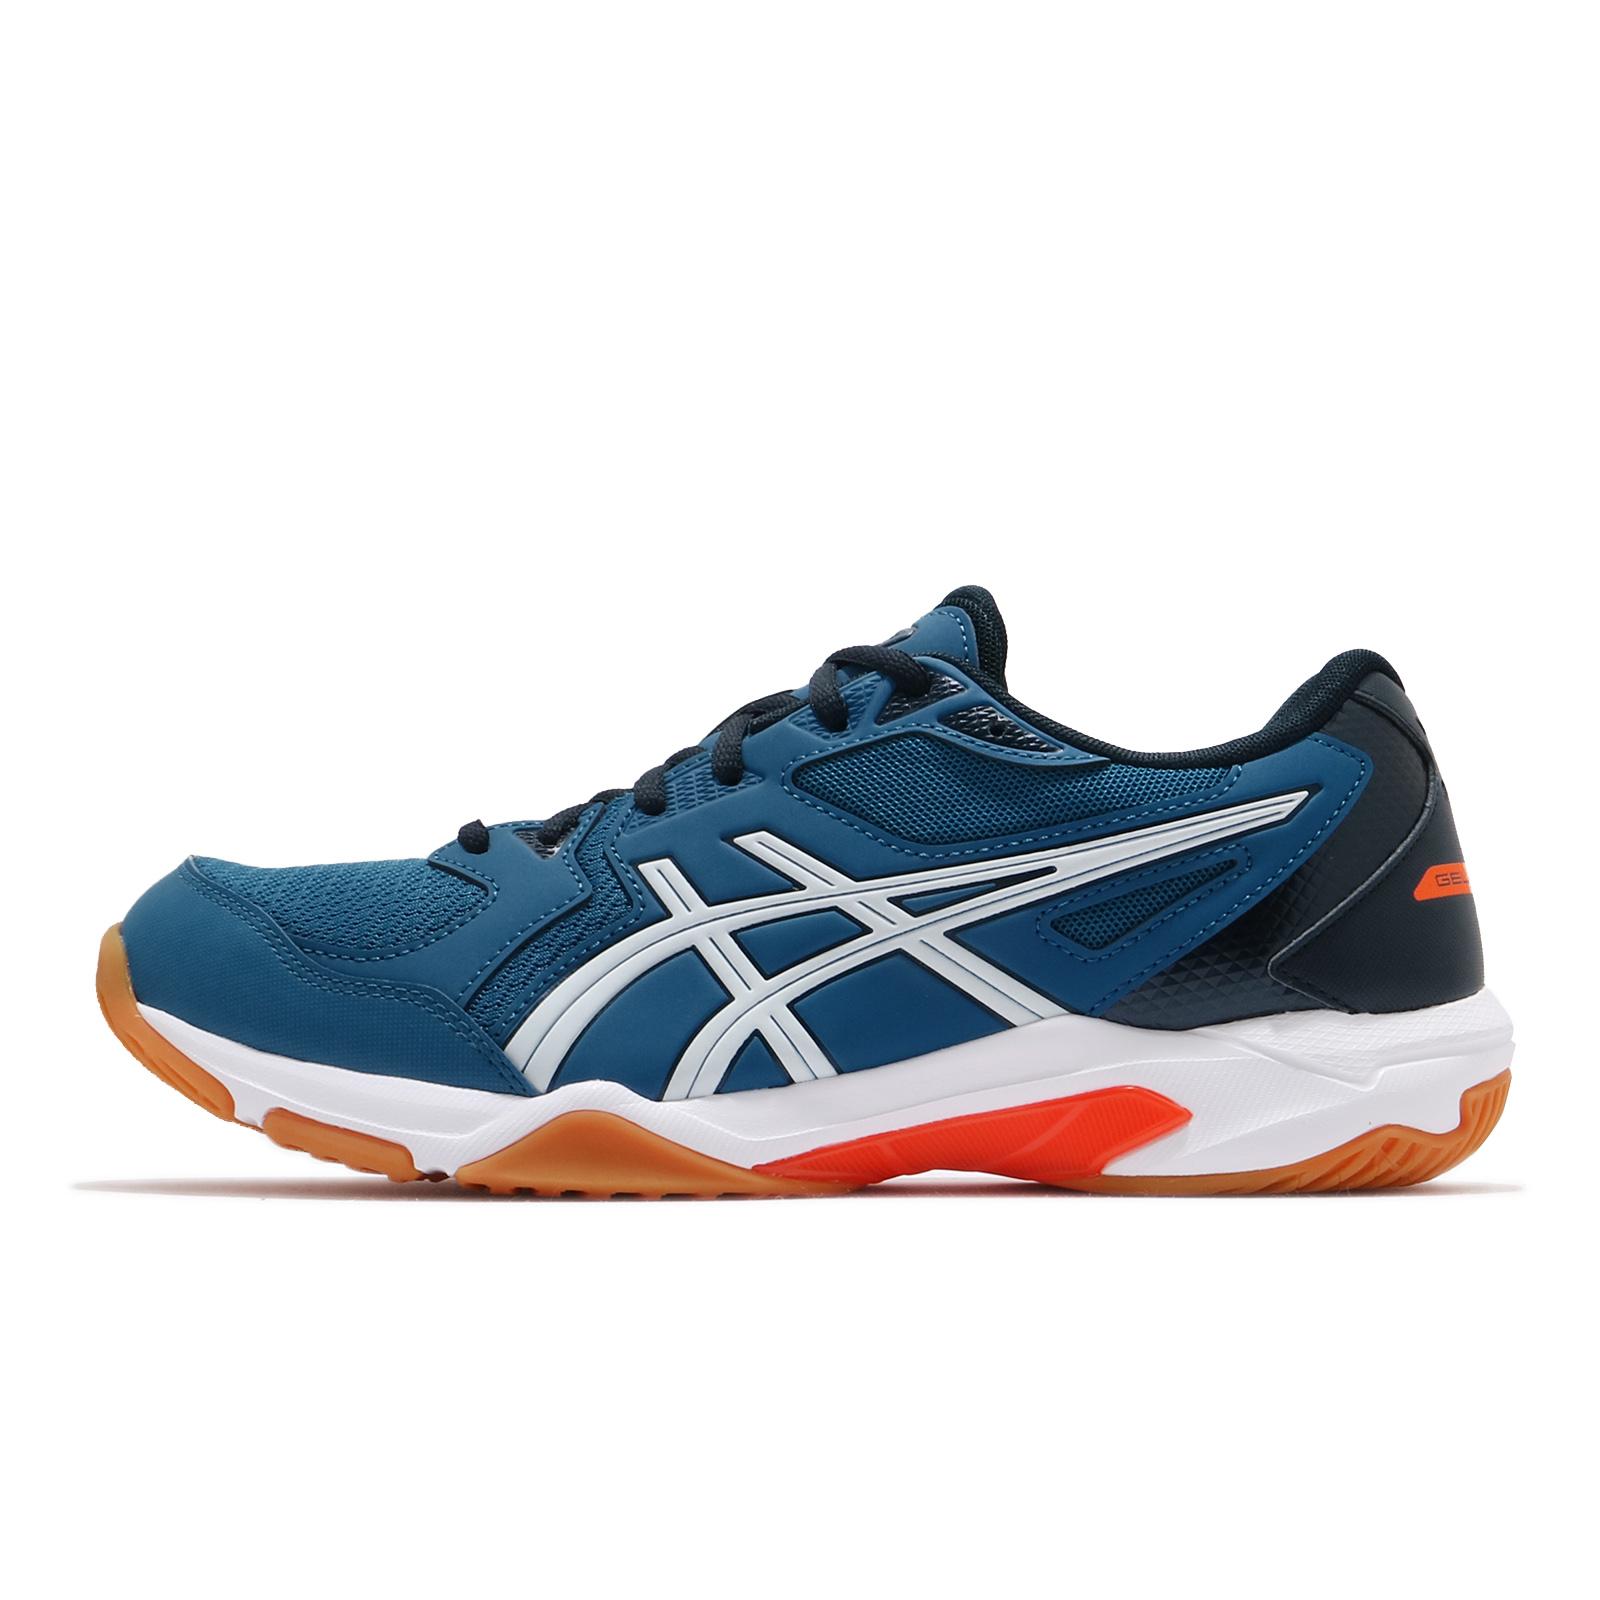 Asics 排球鞋 Gel-Rocket 10 男 藍 橘 膠底 羽球 室內運動鞋 【ACS】 1071A054-401